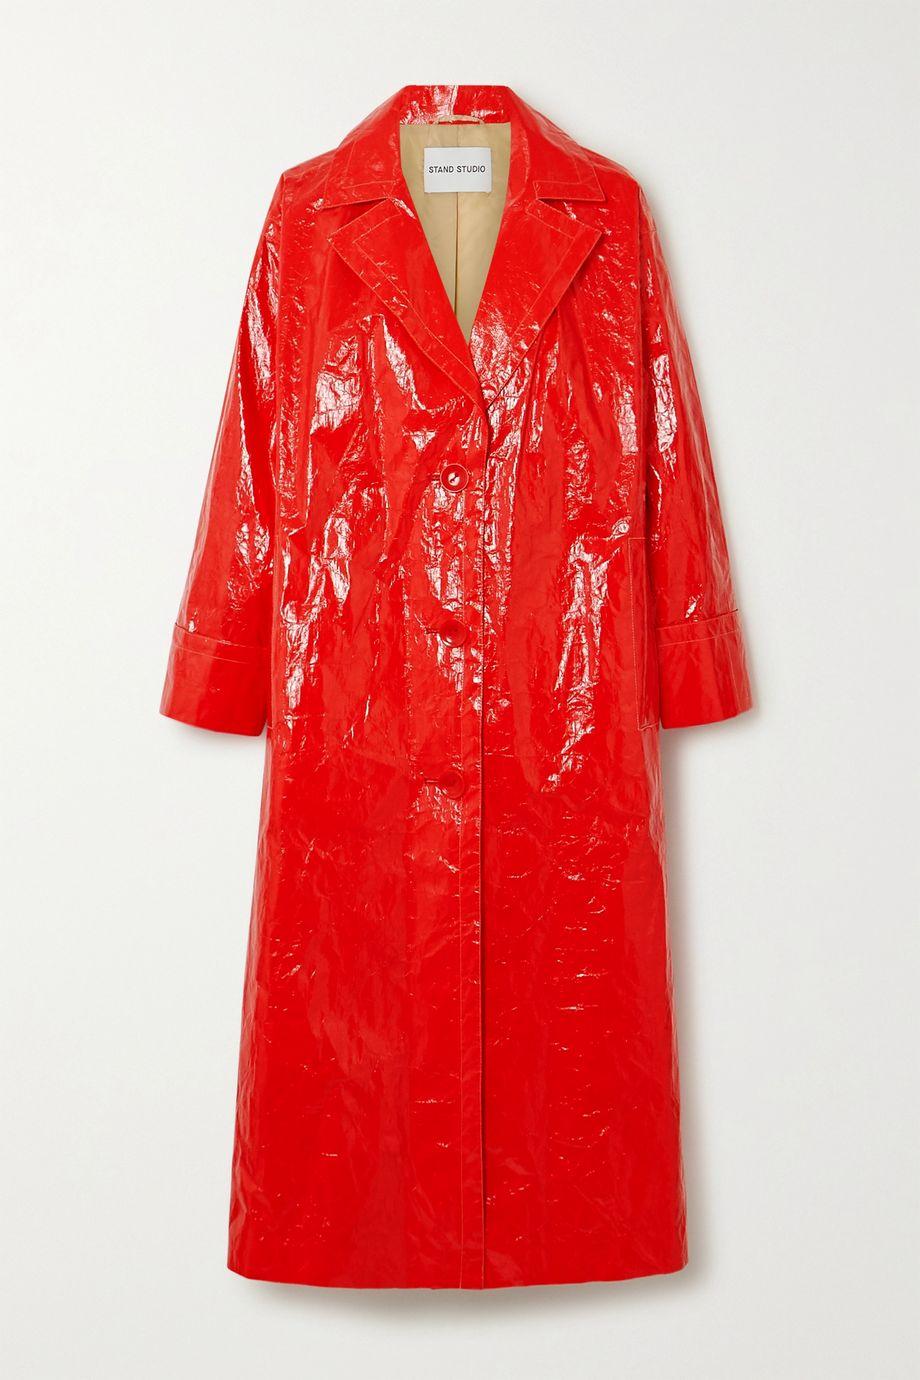 Stand Studio Lexie vinyl coat